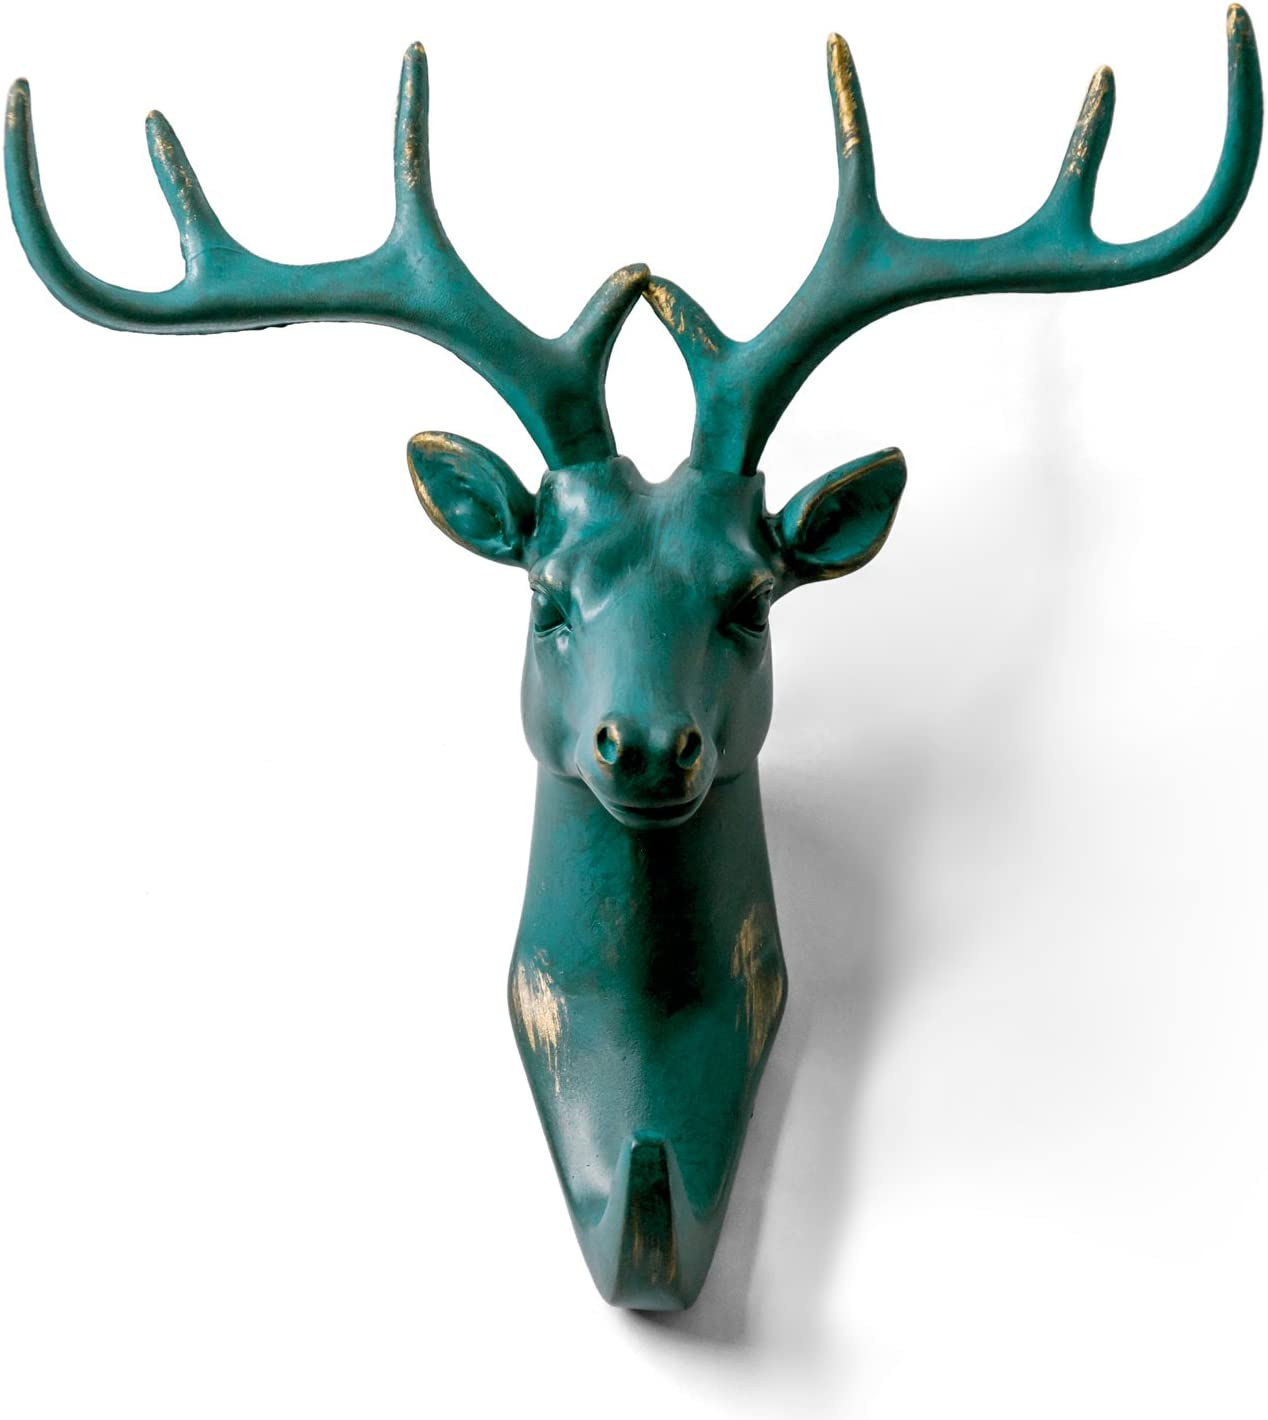 HERNGEE Deer Head Single Wall Hook/Hanger Animal Shaped Coat Hat Hook Heavy Duty, Rustic, Decorative Gift, Rustic Bronze Color